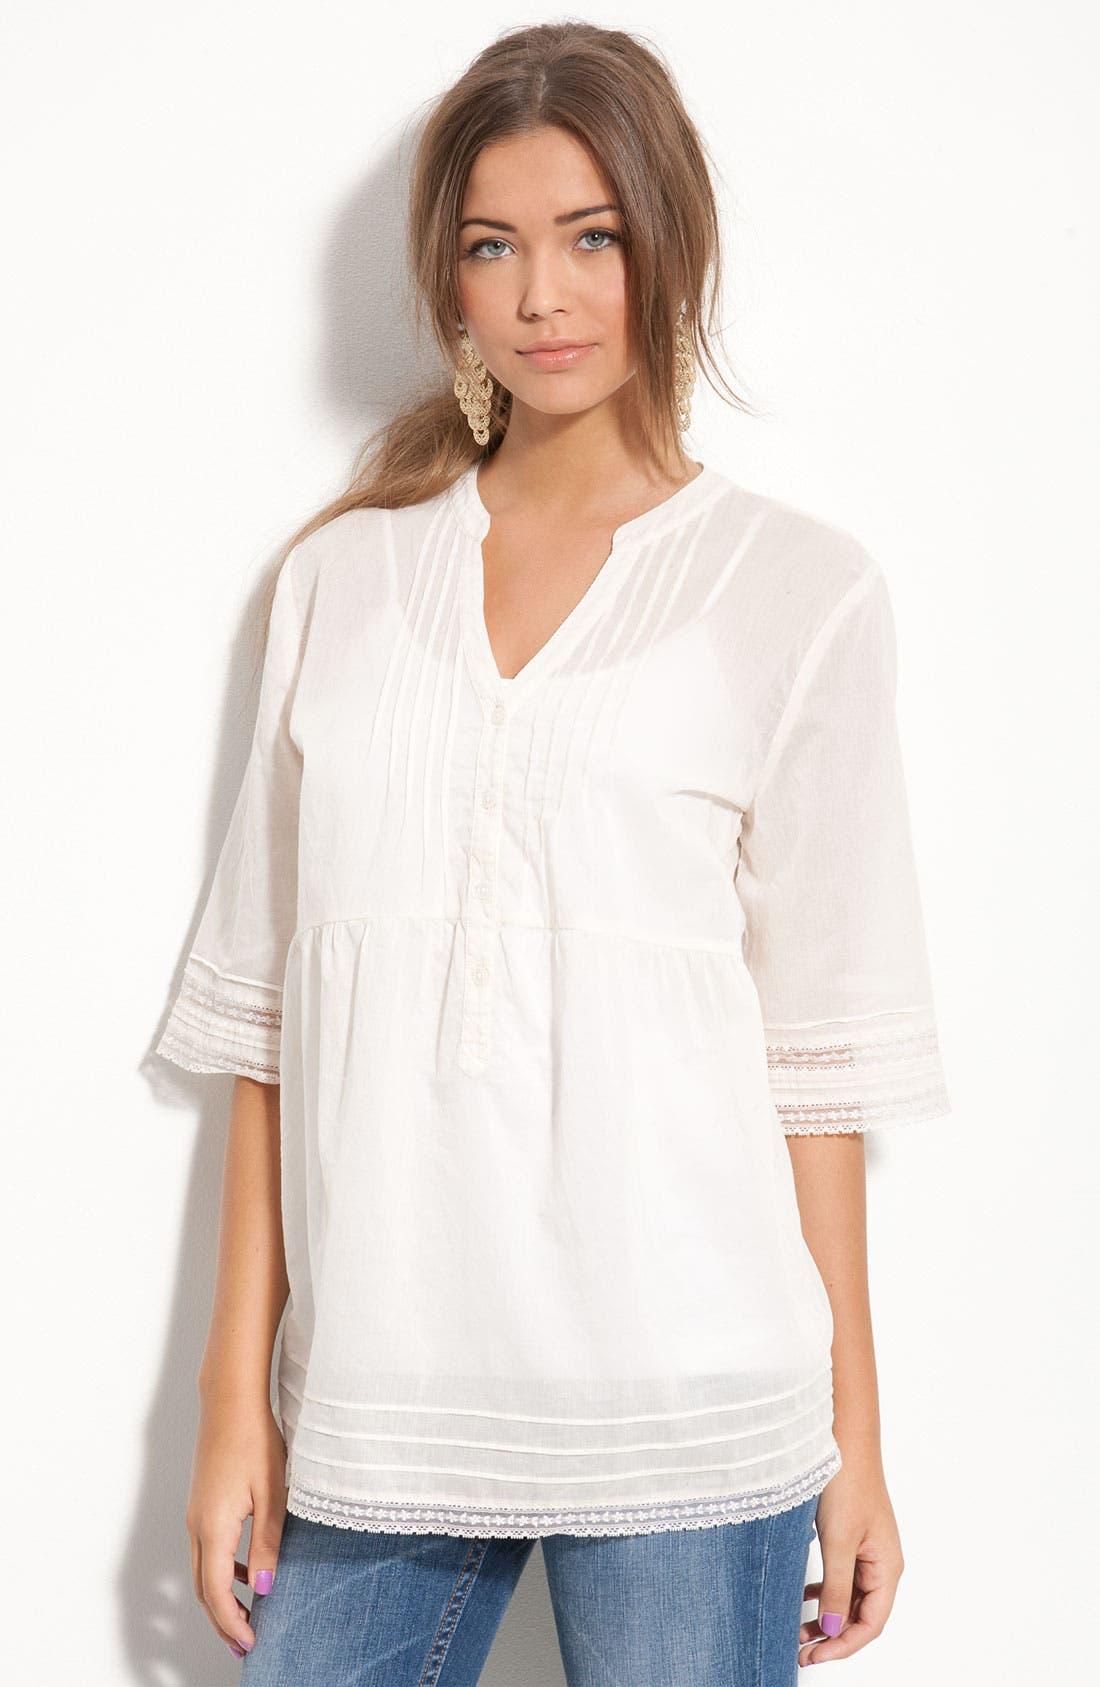 Main Image - Frenchi® Pintuck & Lace Shirt (Juniors)